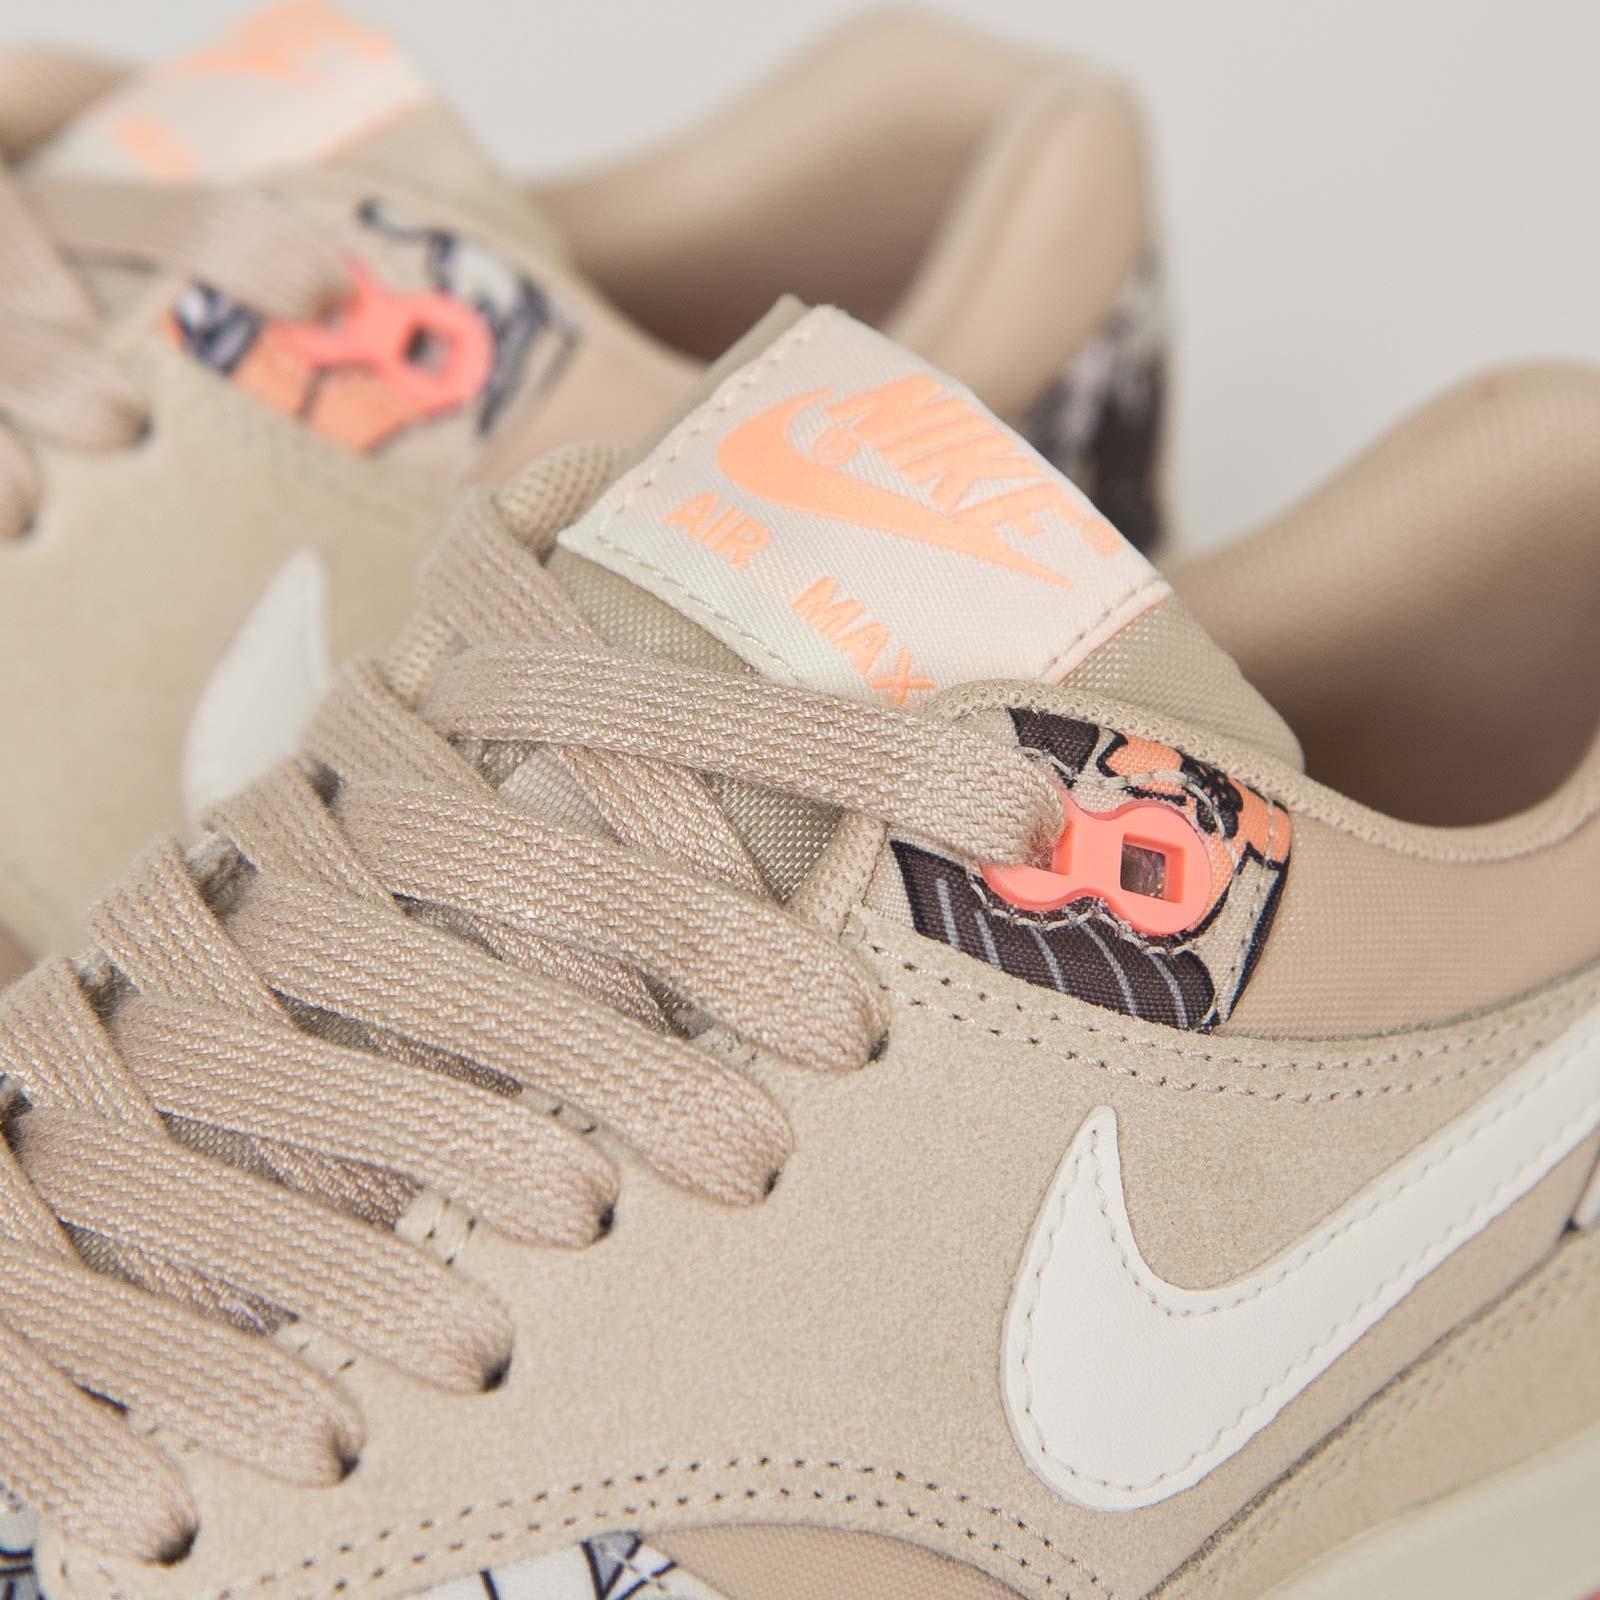 Nike Wmns Air Max 1 Print 528898 200 Sneakersnstuff